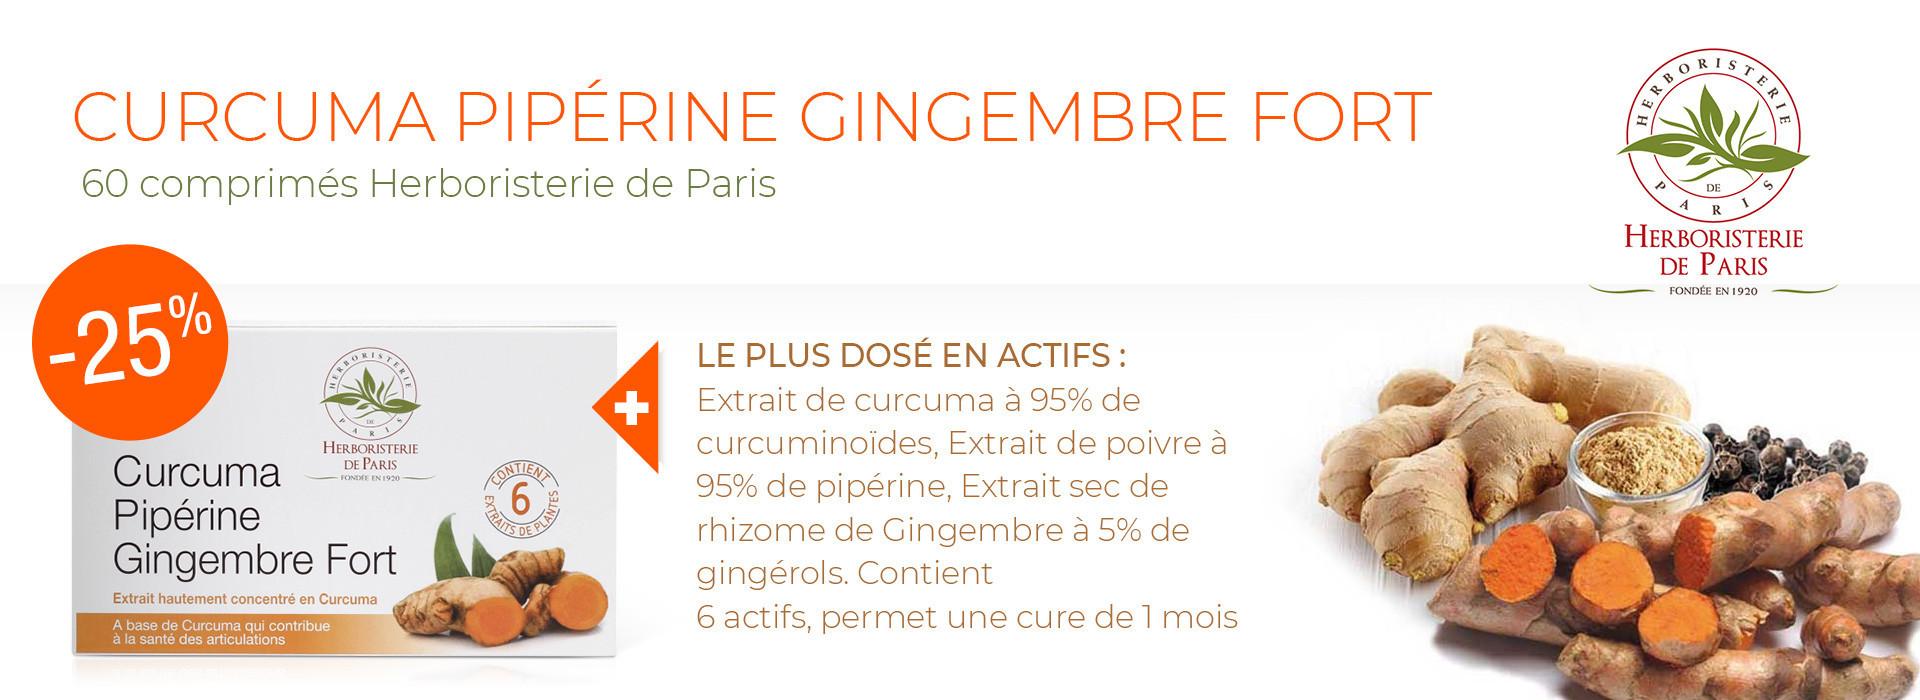 curcuma pipérine gingembre fort